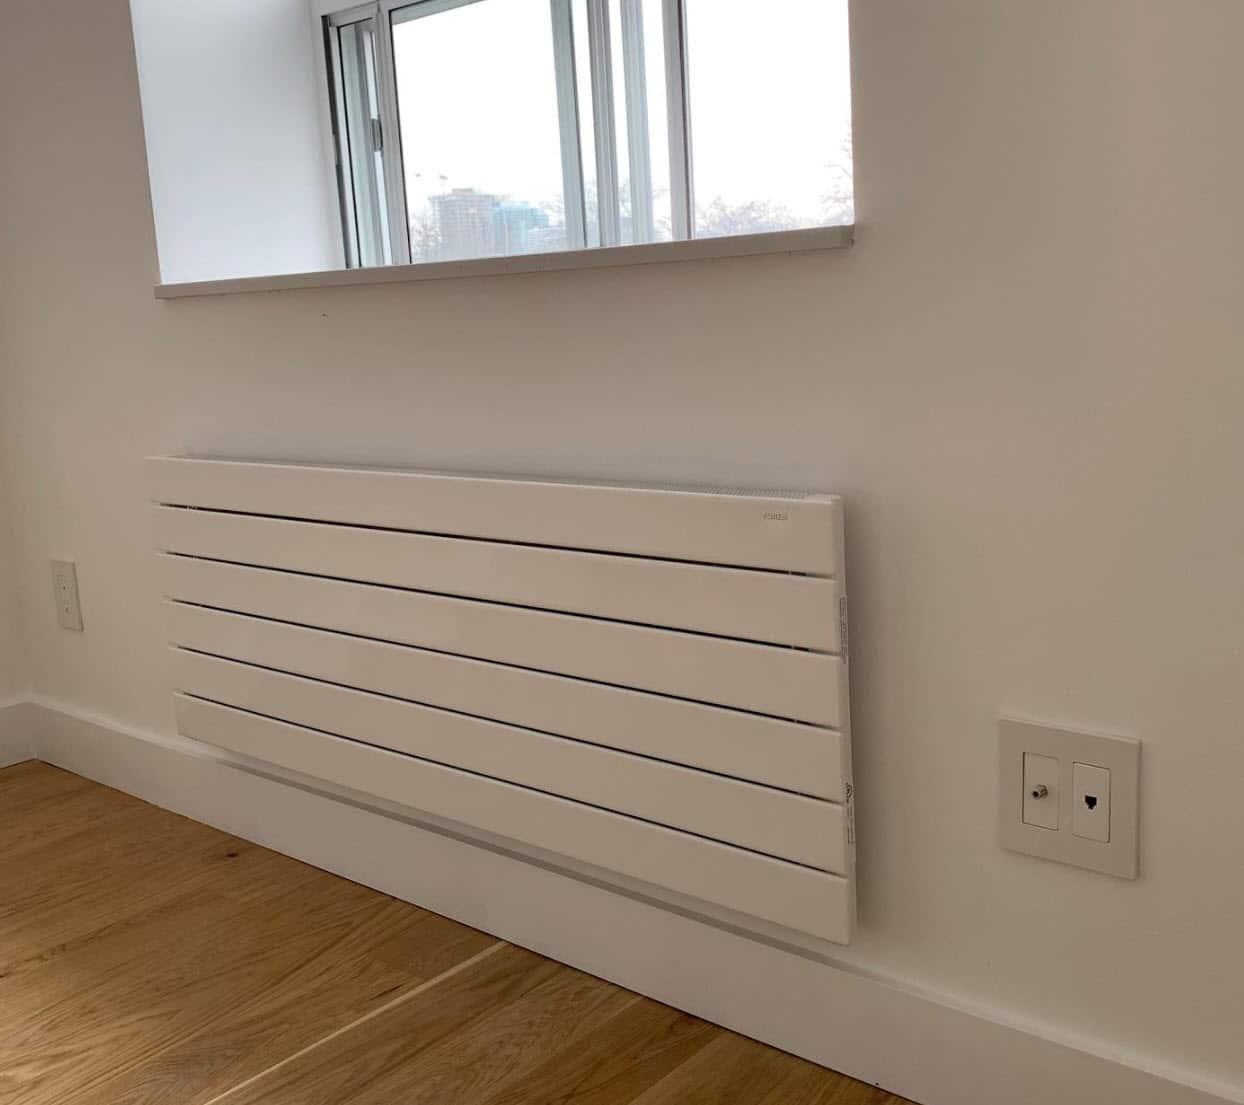 wall panel electric radiators 1